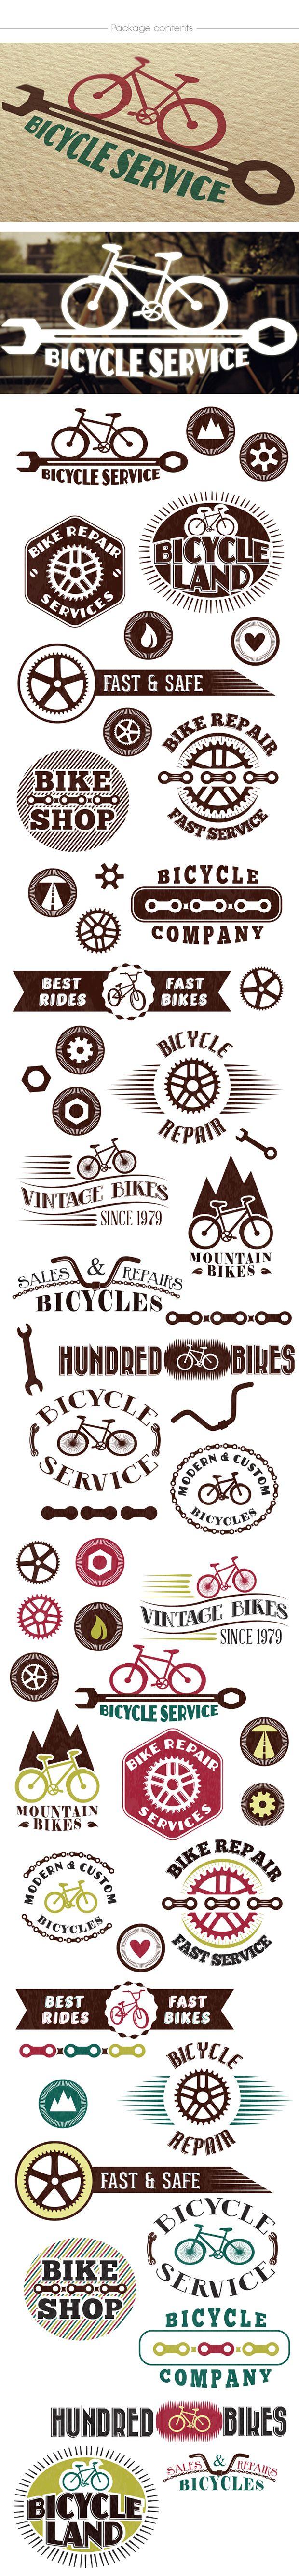 logozilla2-logo-builder-bicycle-shop-large                                                                                                                                                                                 More